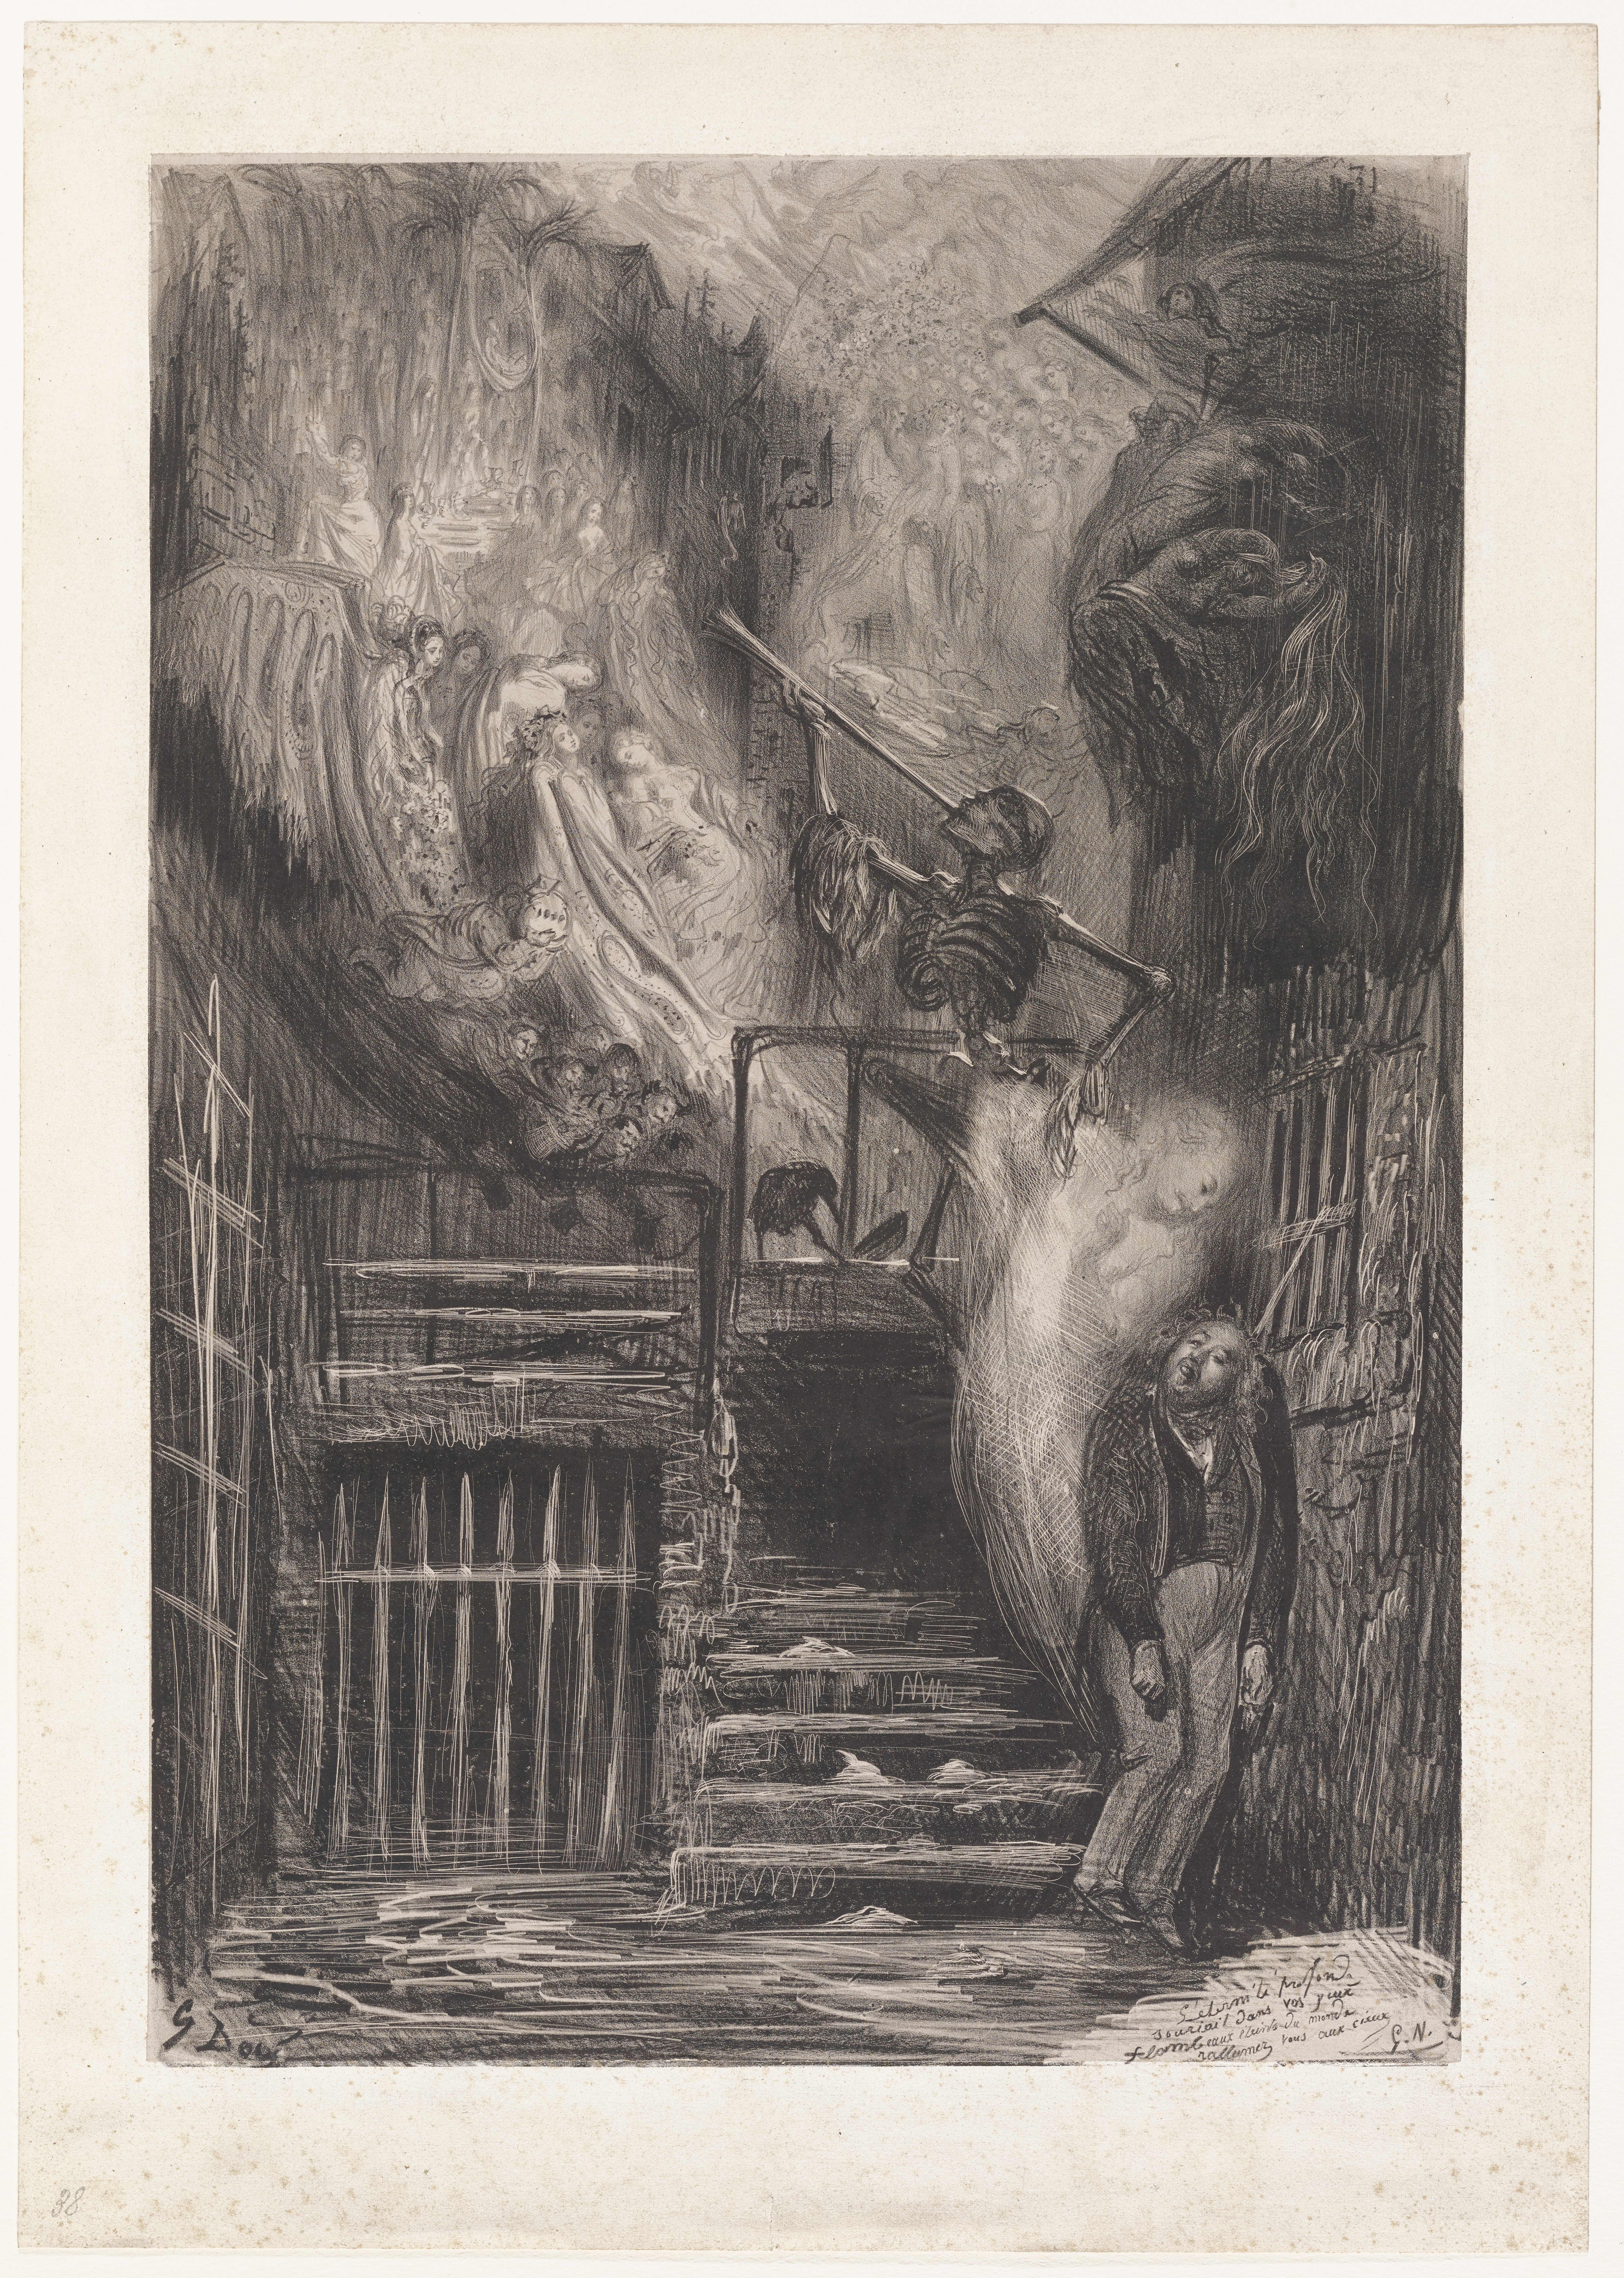 Gerard de Nerval poet